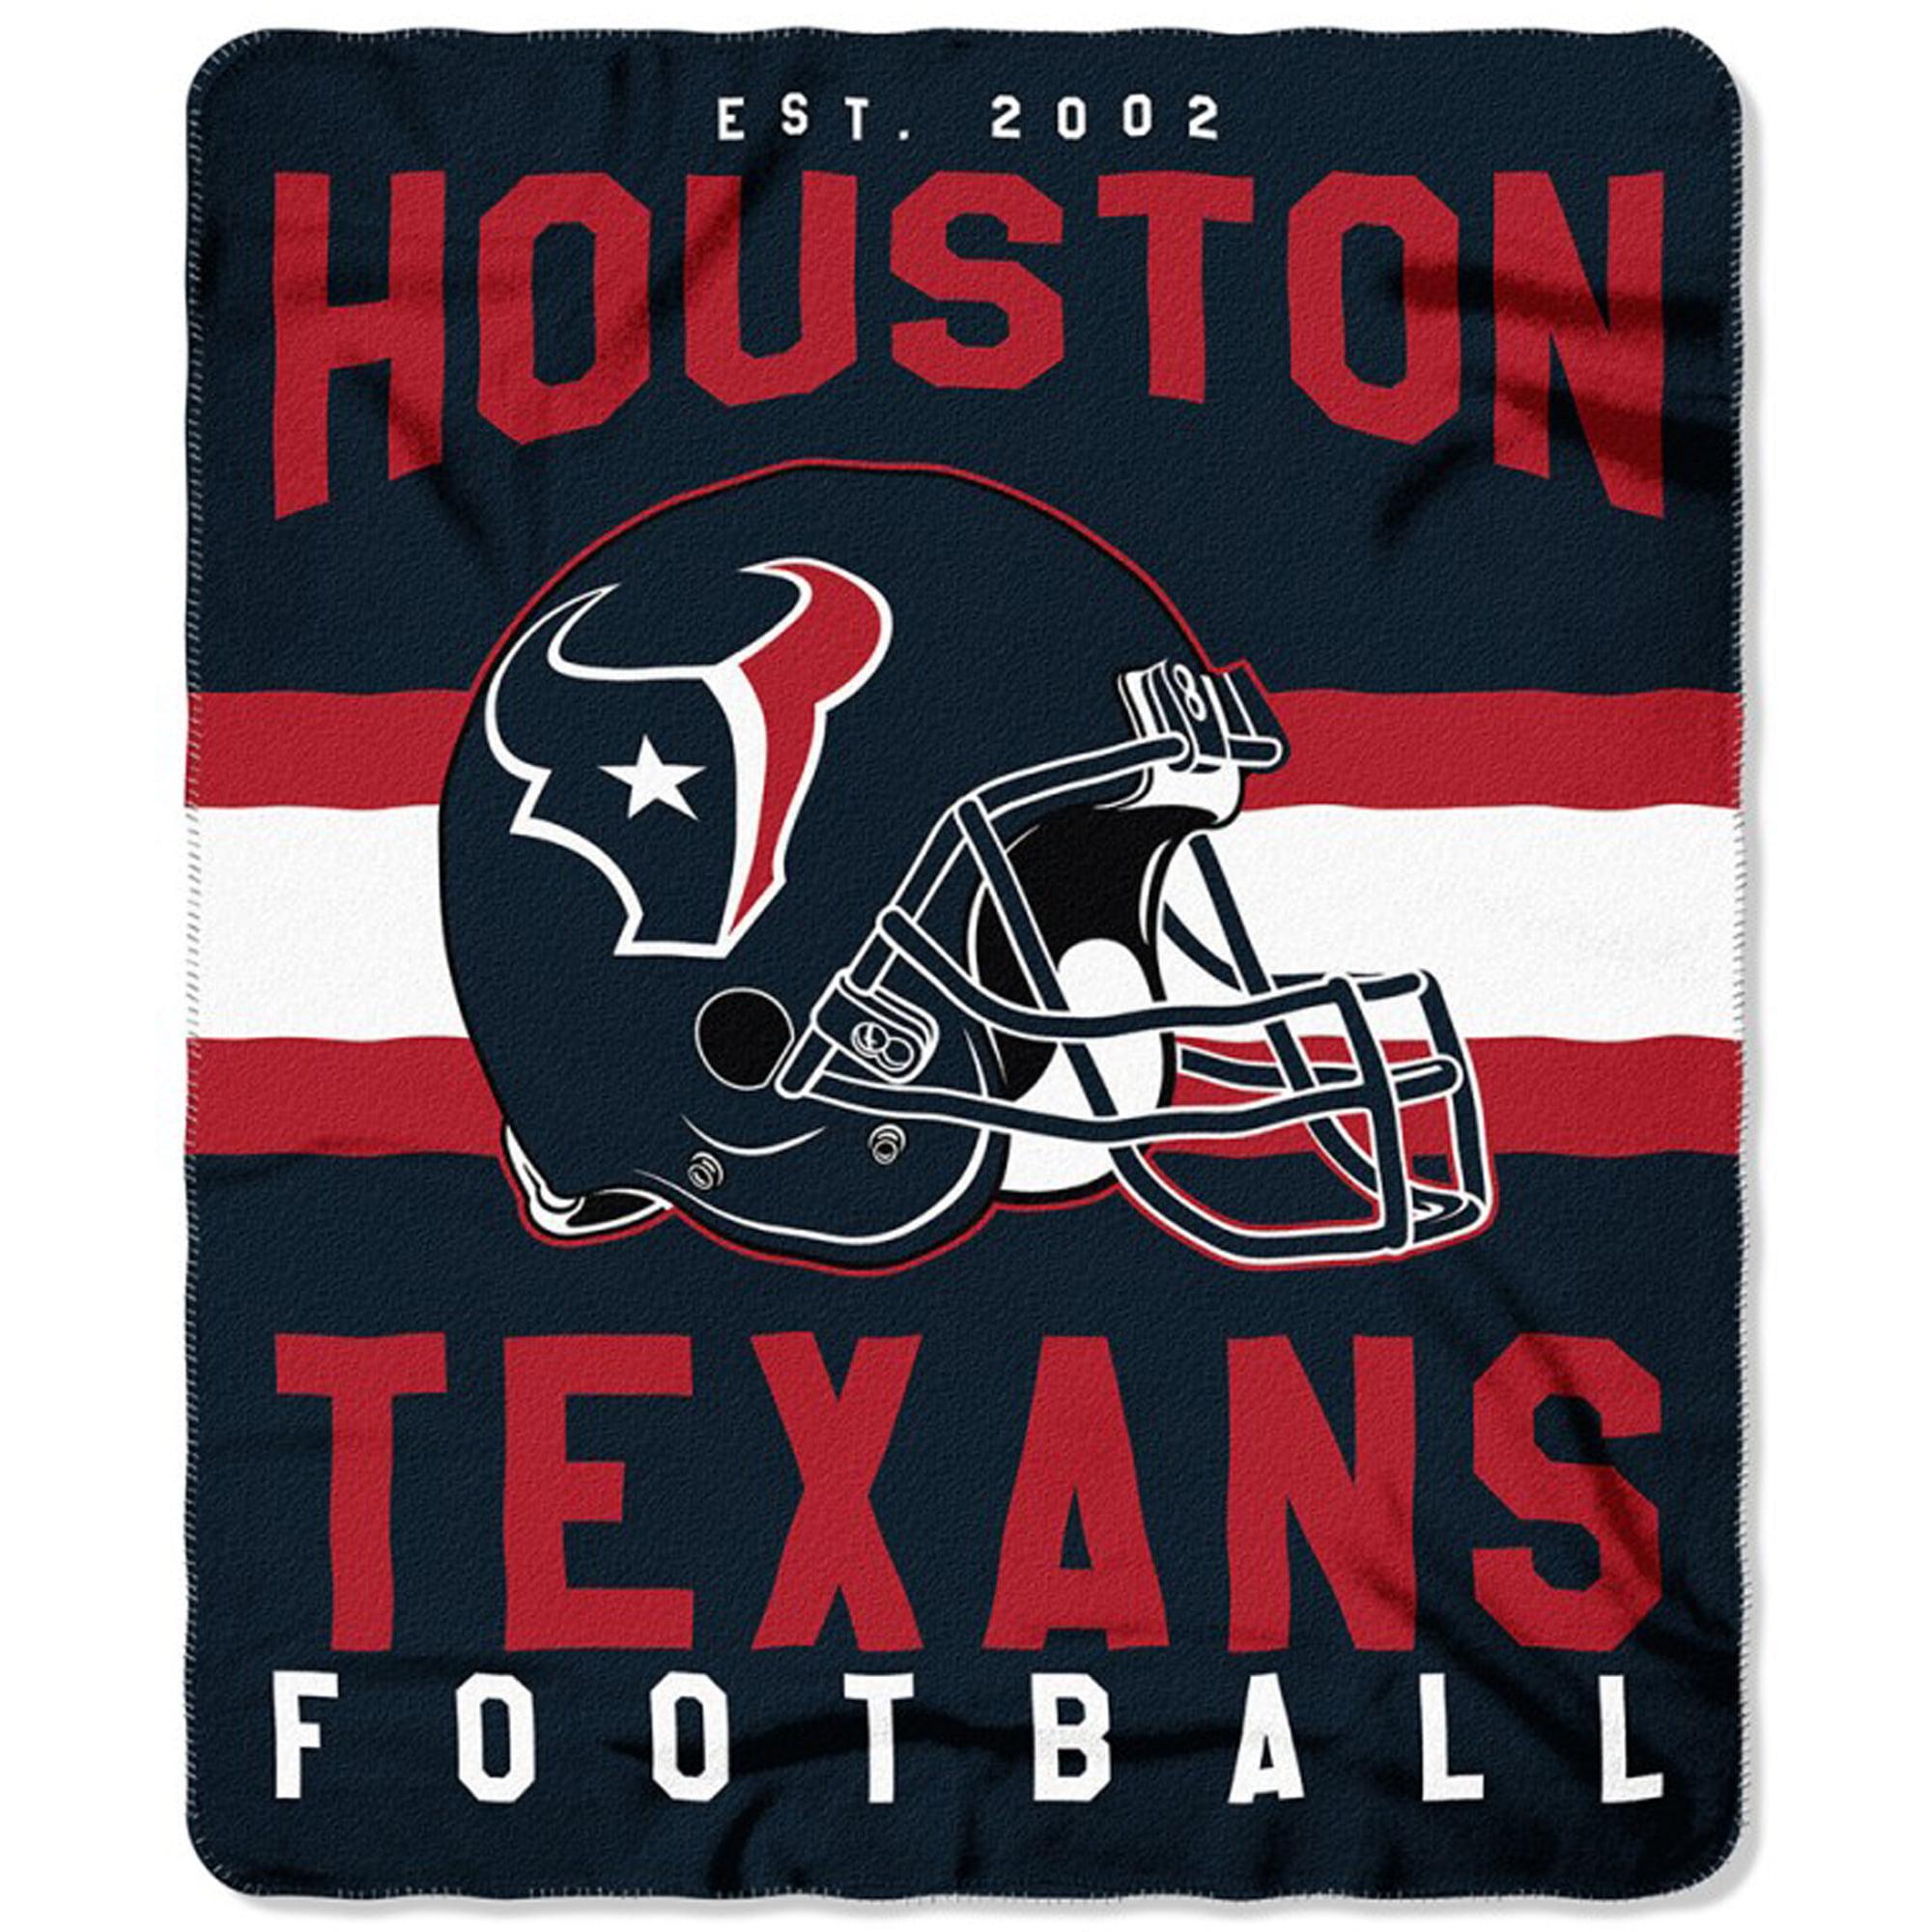 "Houston Texans The Northwest Company 50"" x 60"" Singular Fleece Blanket - No Size"